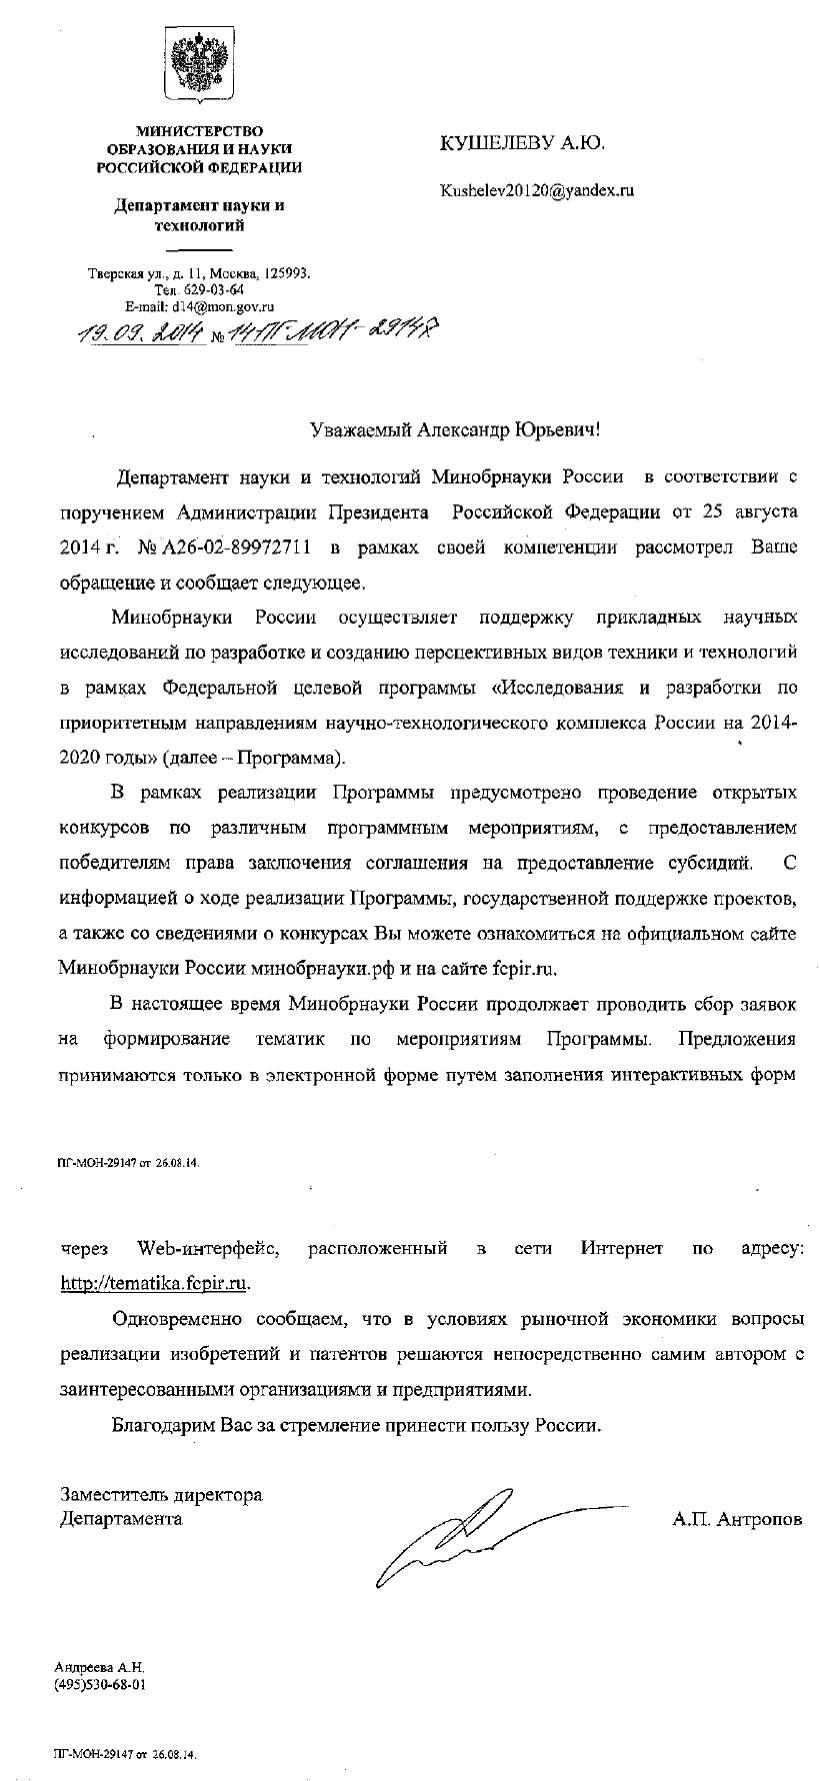 http://img-fotki.yandex.ru/get/6833/158289418.189/0_f8b9f_b04610ac_orig.jpg